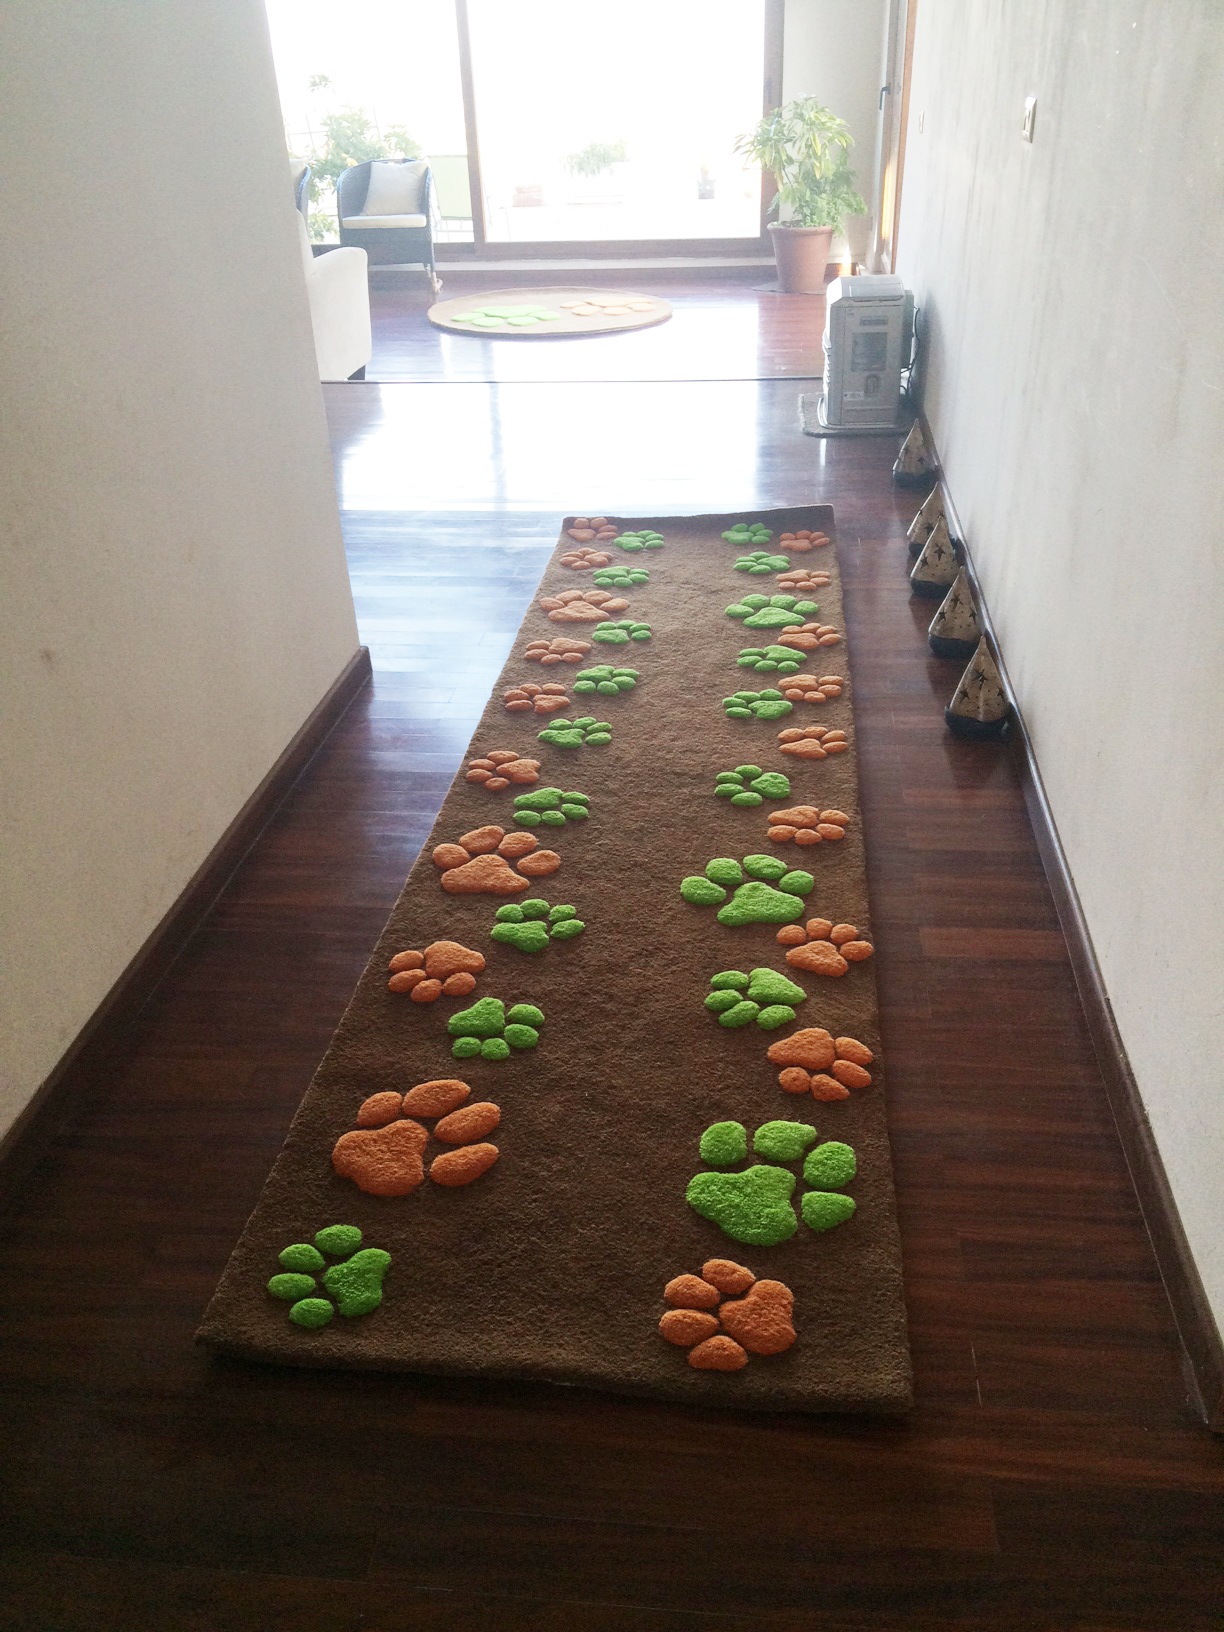 patitas pasillo - alfombrascox.jpeg